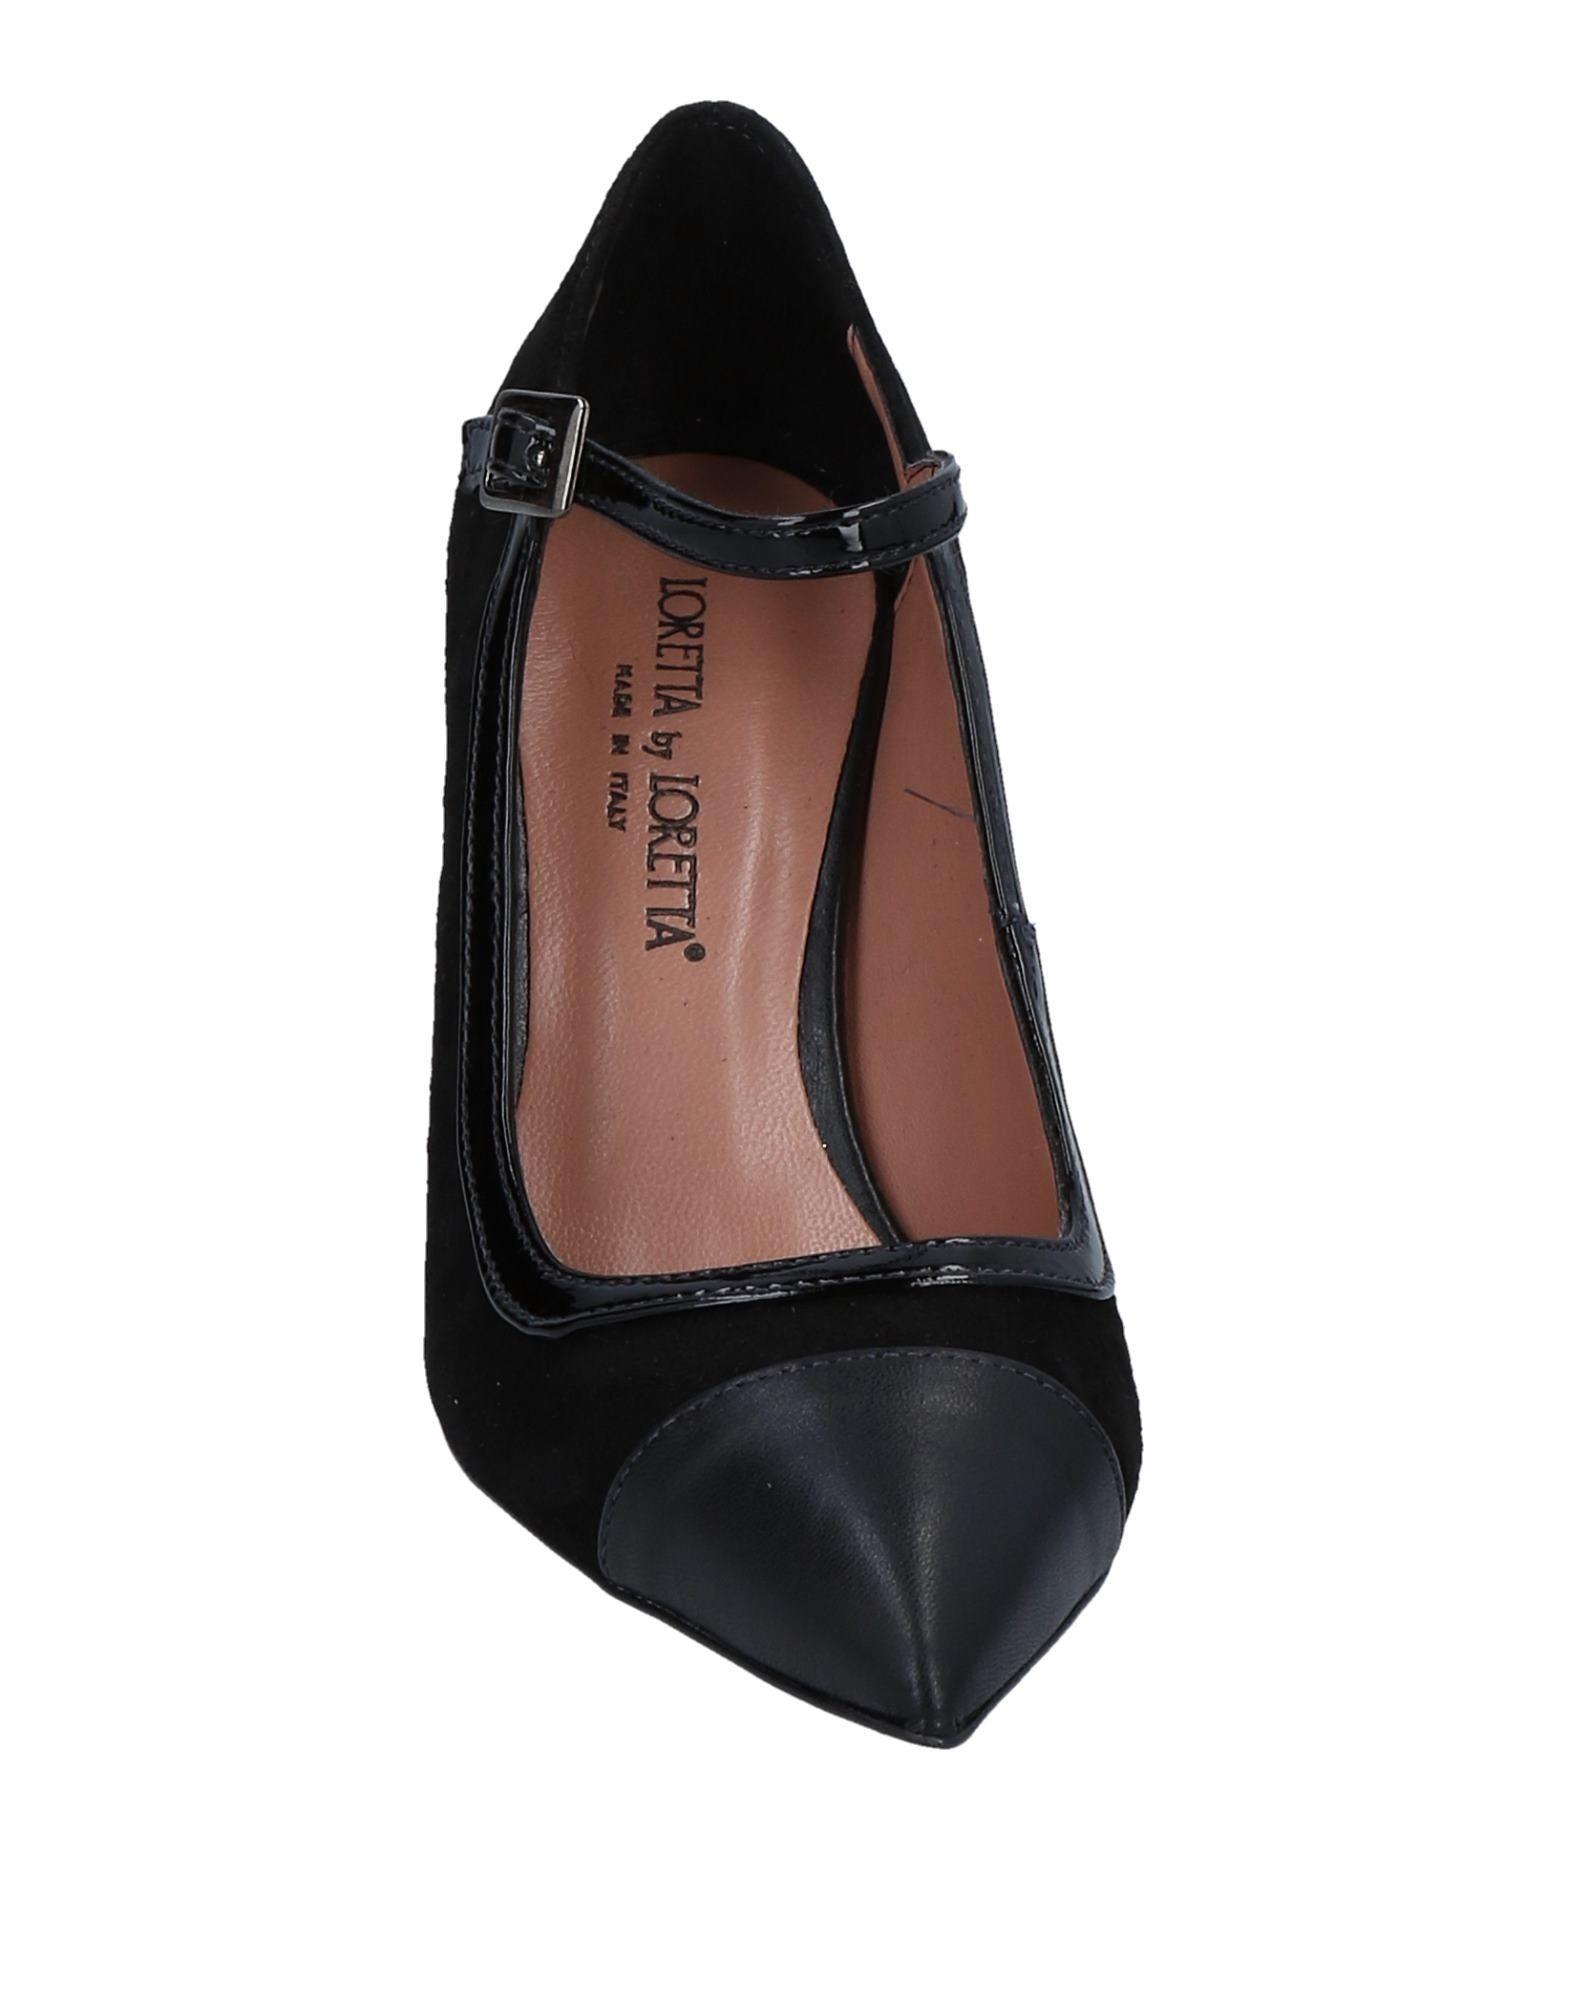 Loretta By Loretta Pumps Damen beliebte  11506385WW Gute Qualität beliebte Damen Schuhe 6cff06